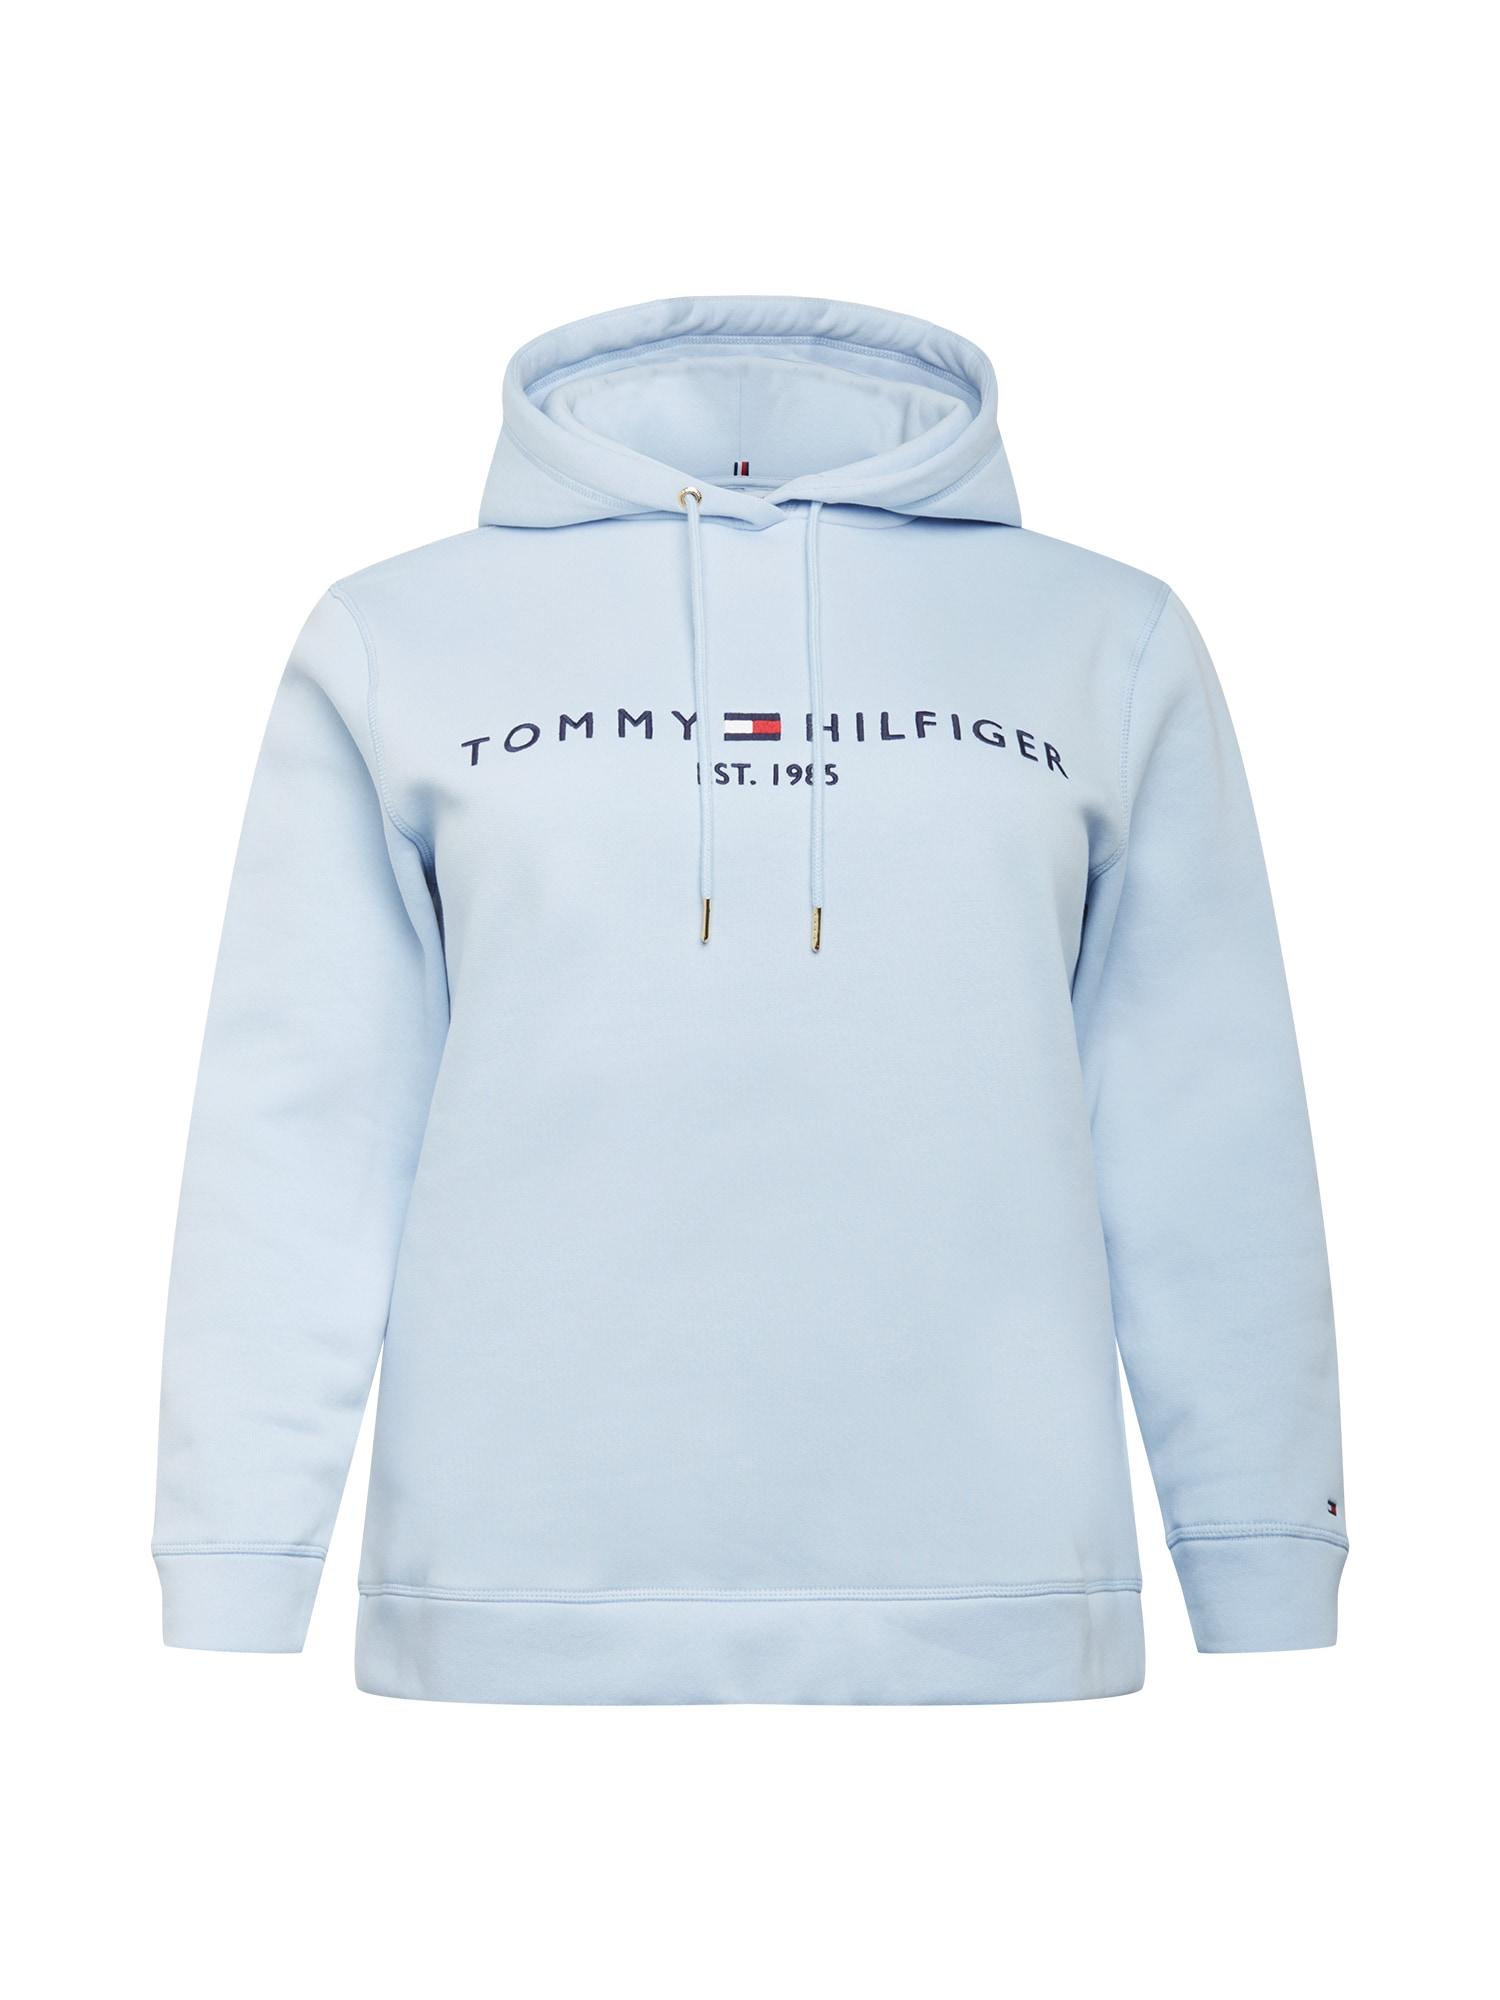 Tommy Hilfiger Curve Megztinis be užsegimo šviesiai mėlyna / tamsiai mėlyna jūros spalva / balta / raudona